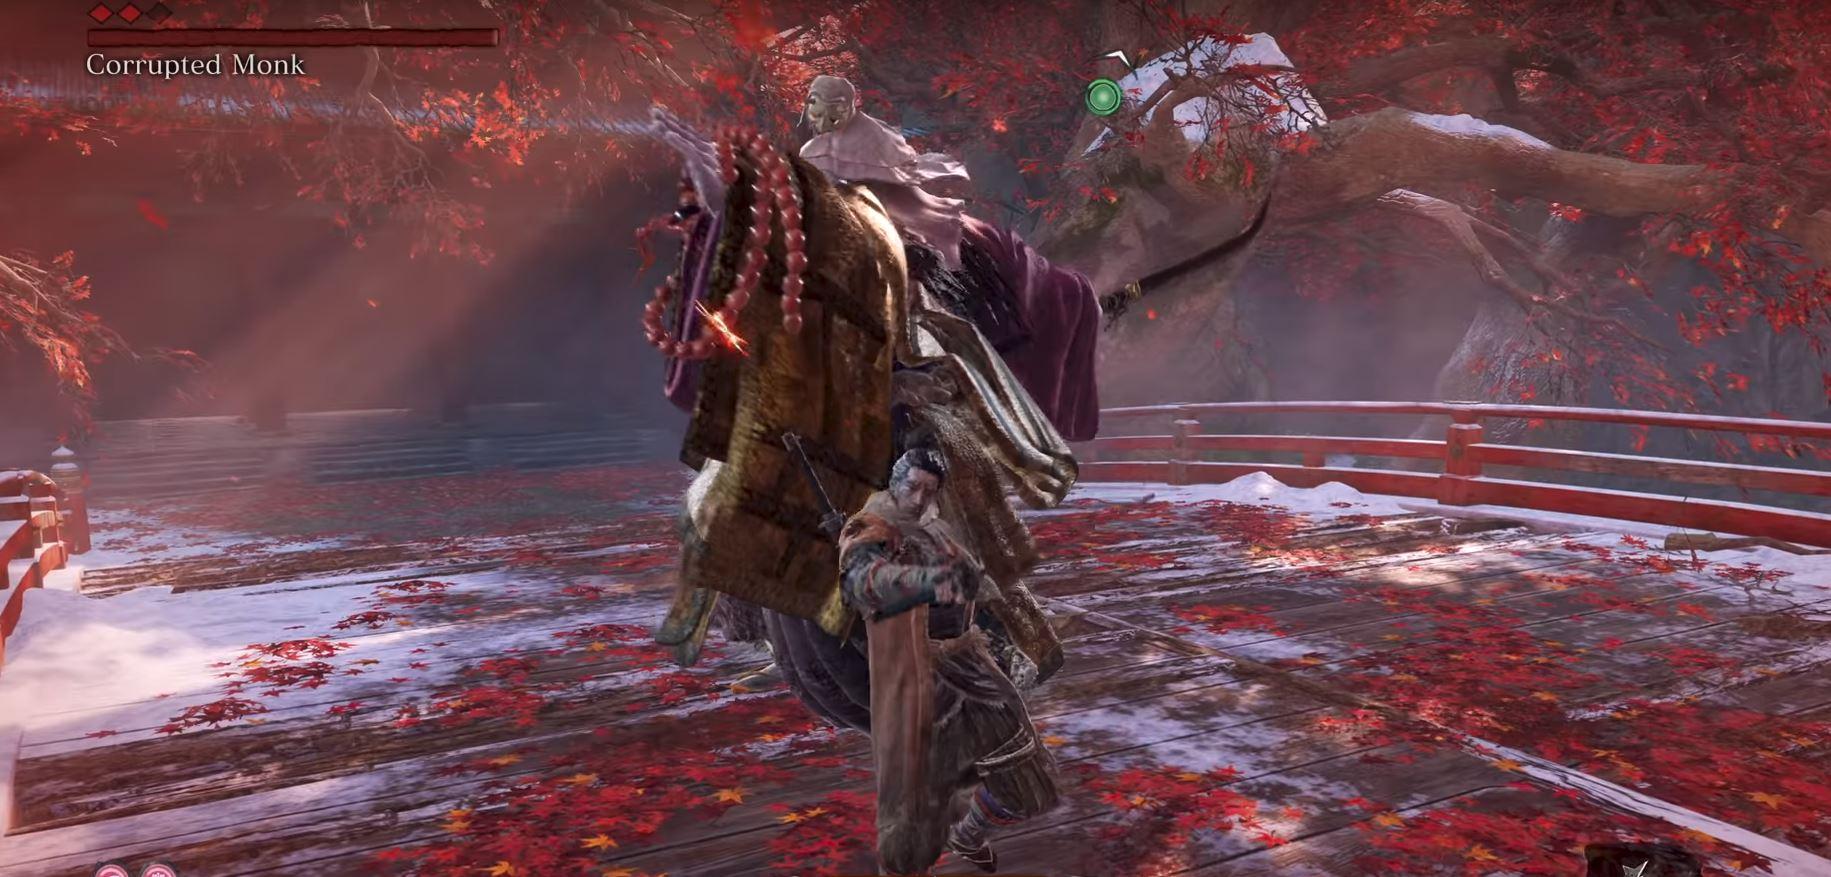 sekiro shadows die twice corrupted monk